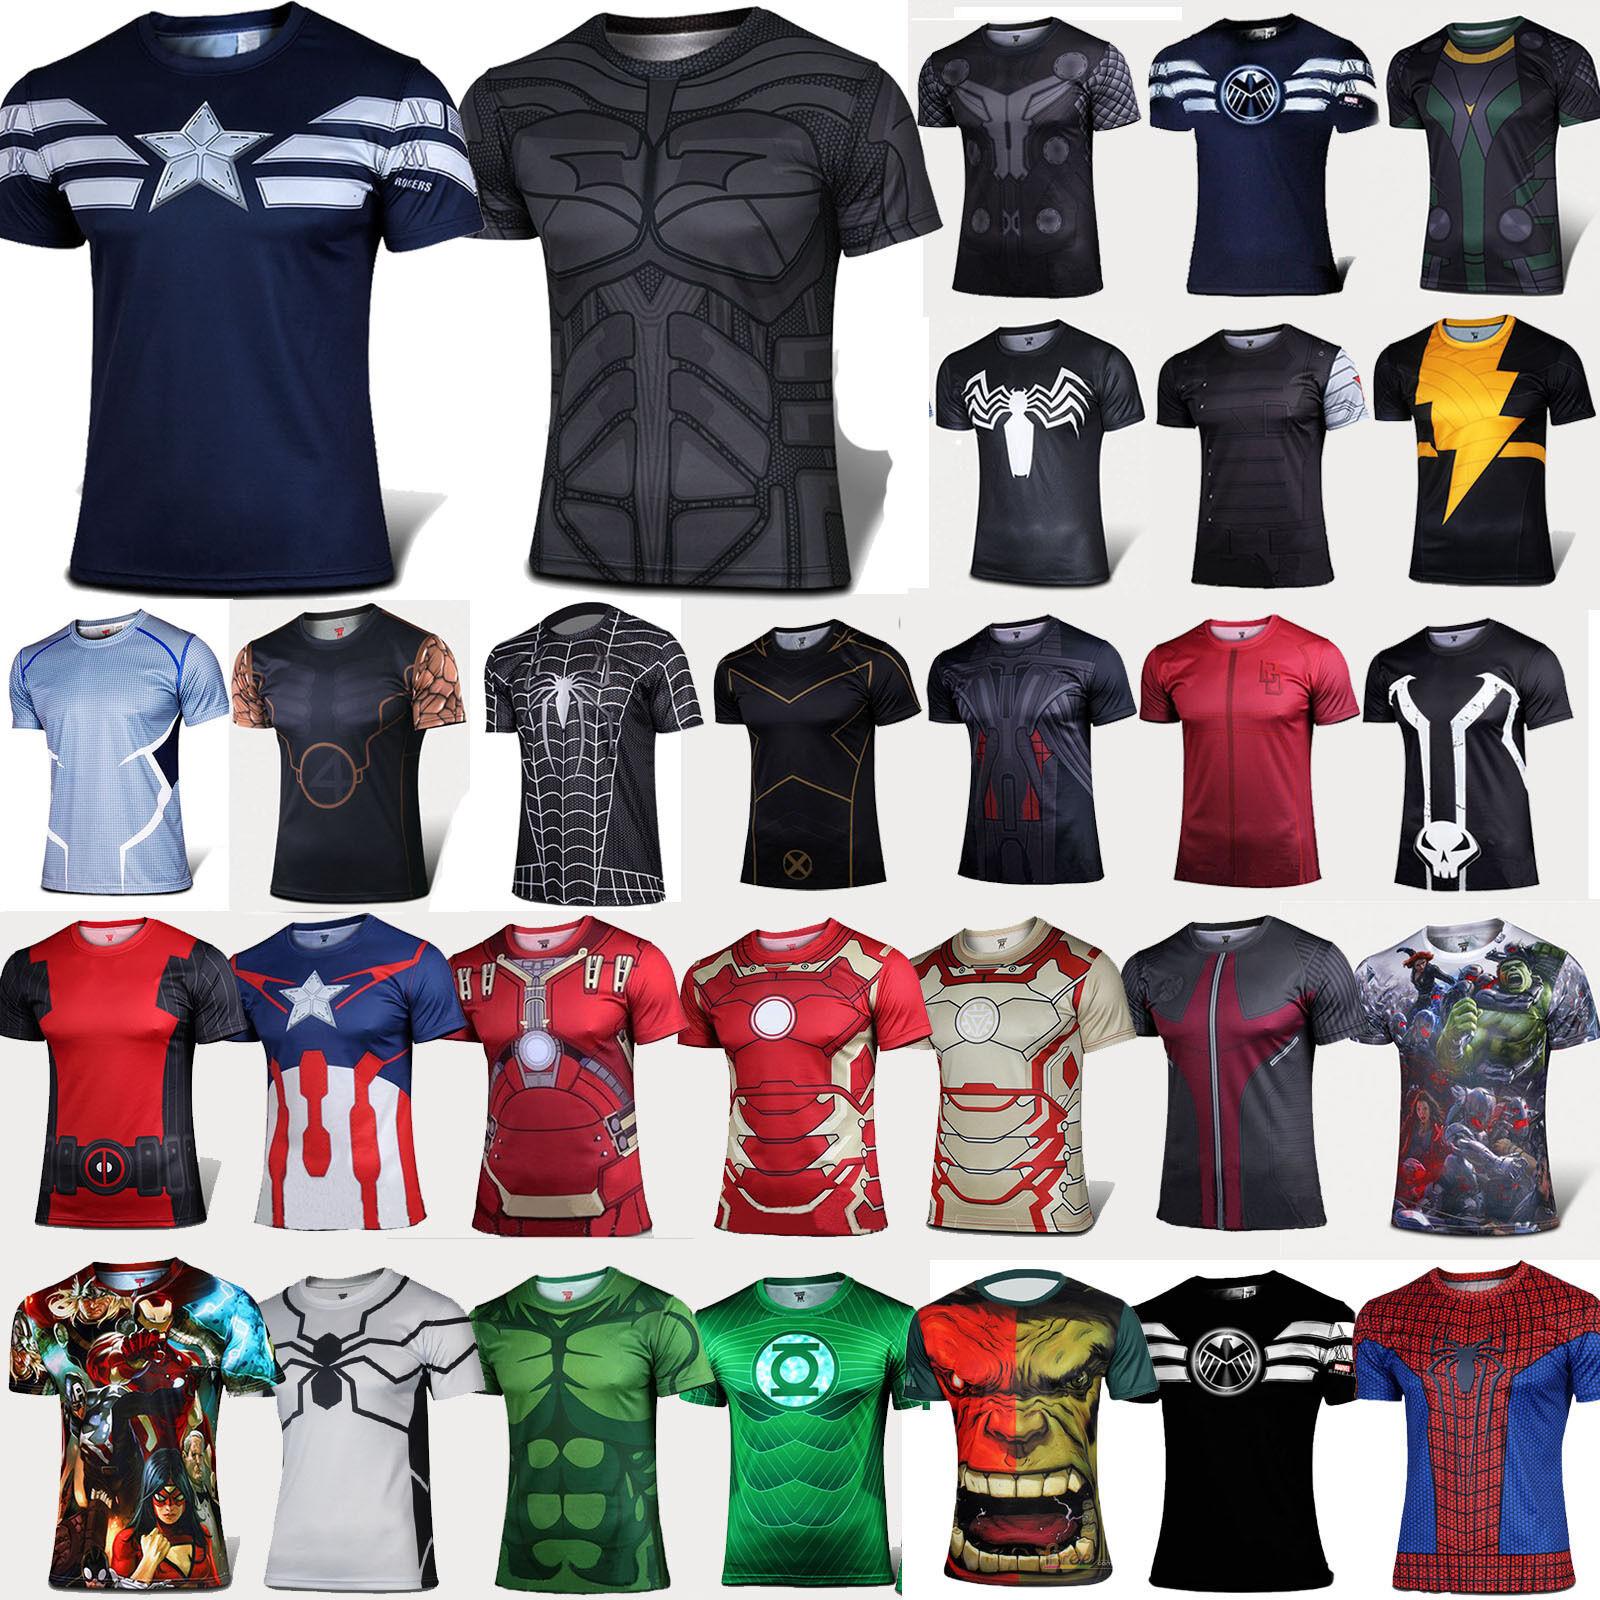 Uomo Supereroe T-Shirt Capitan America Sport Palestra Atleta Muscolo Jersey